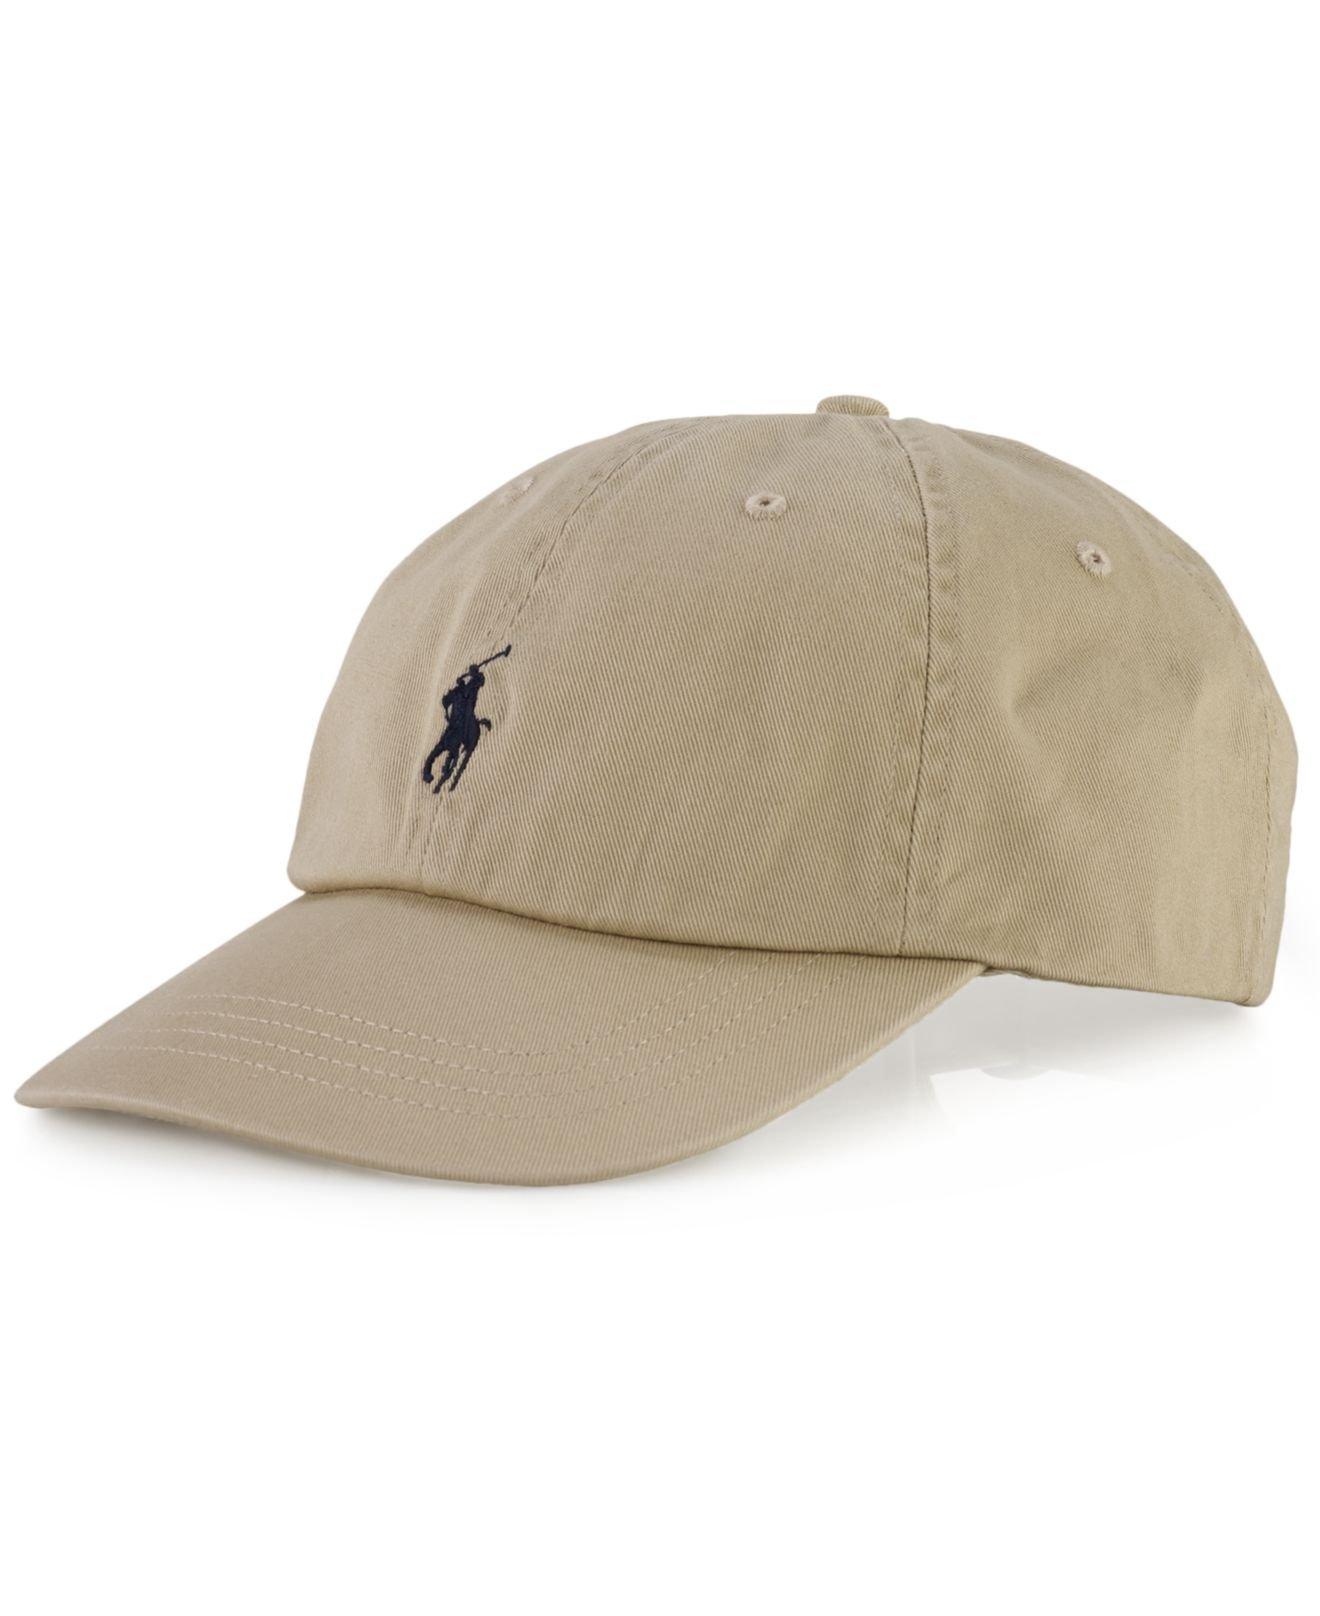 polo ralph lauren core classic sport cap in beige for men nubuck. Black Bedroom Furniture Sets. Home Design Ideas